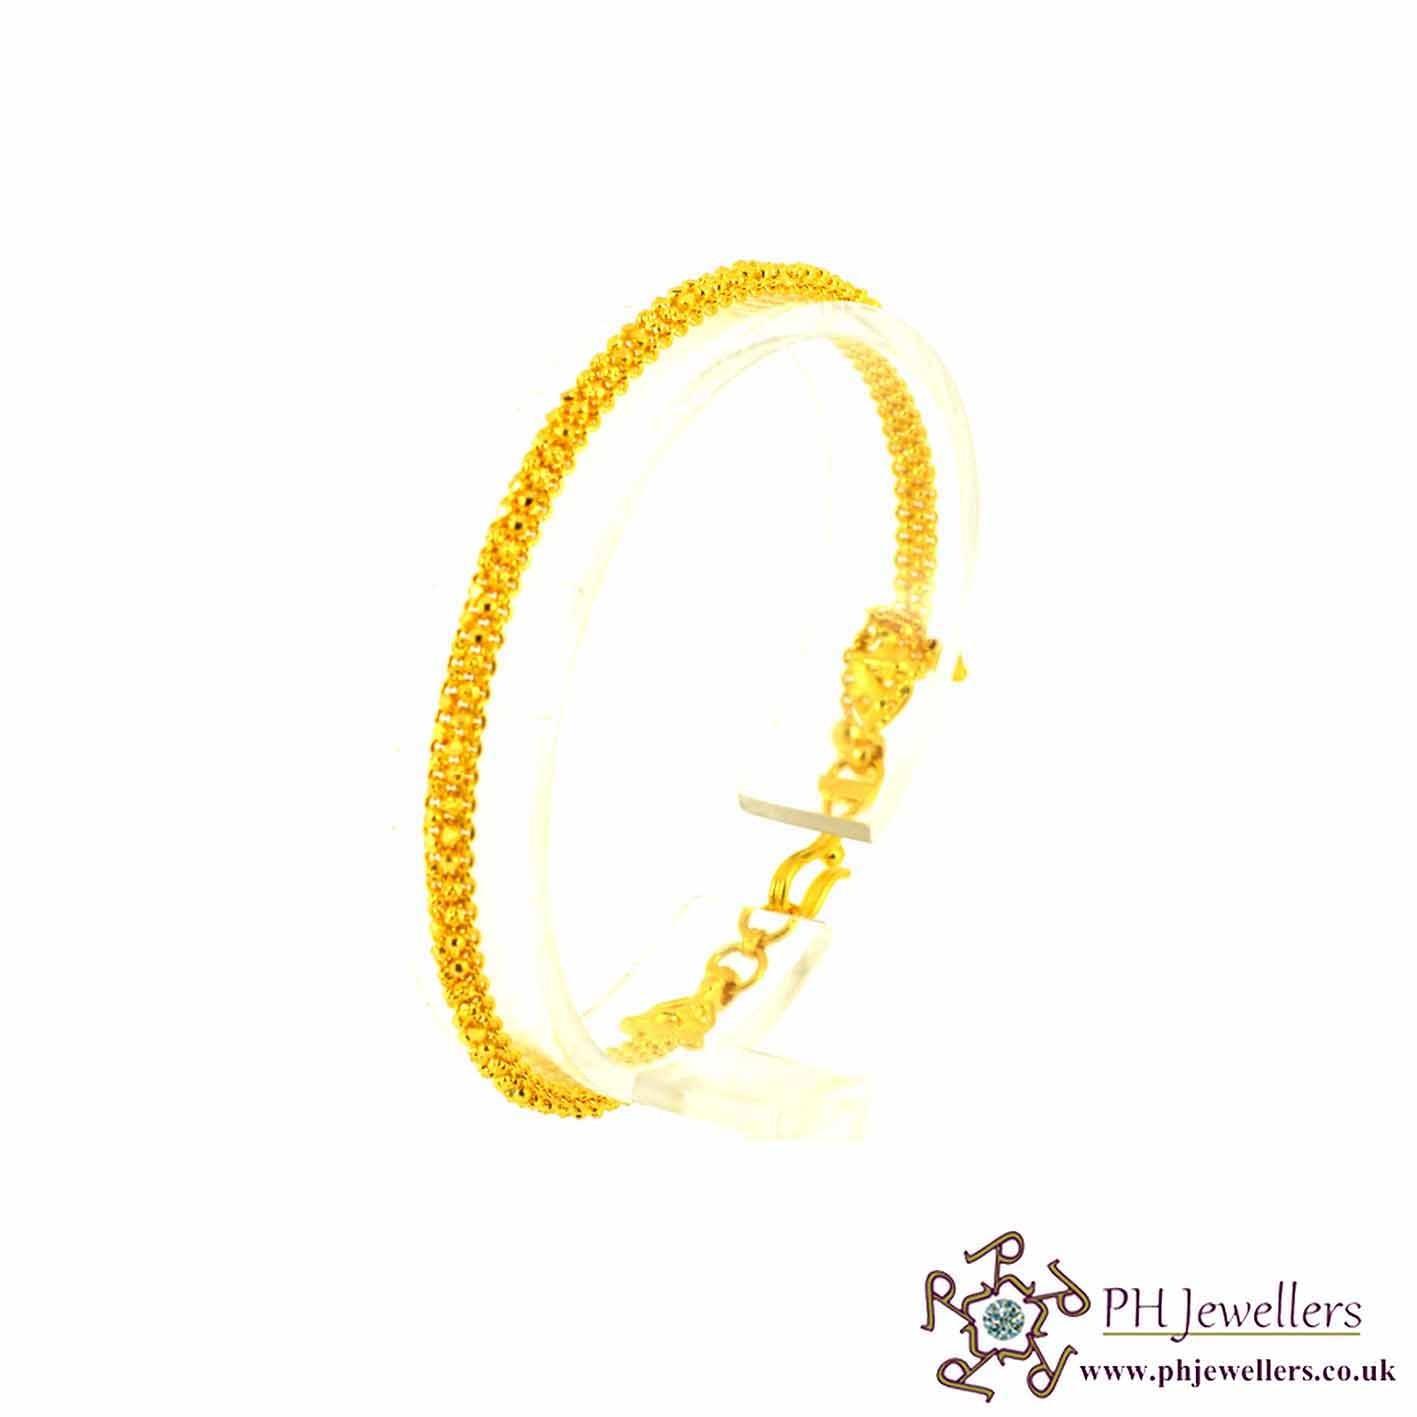 22ct 916 Hallmark Yellow Gold Bracelet LB3